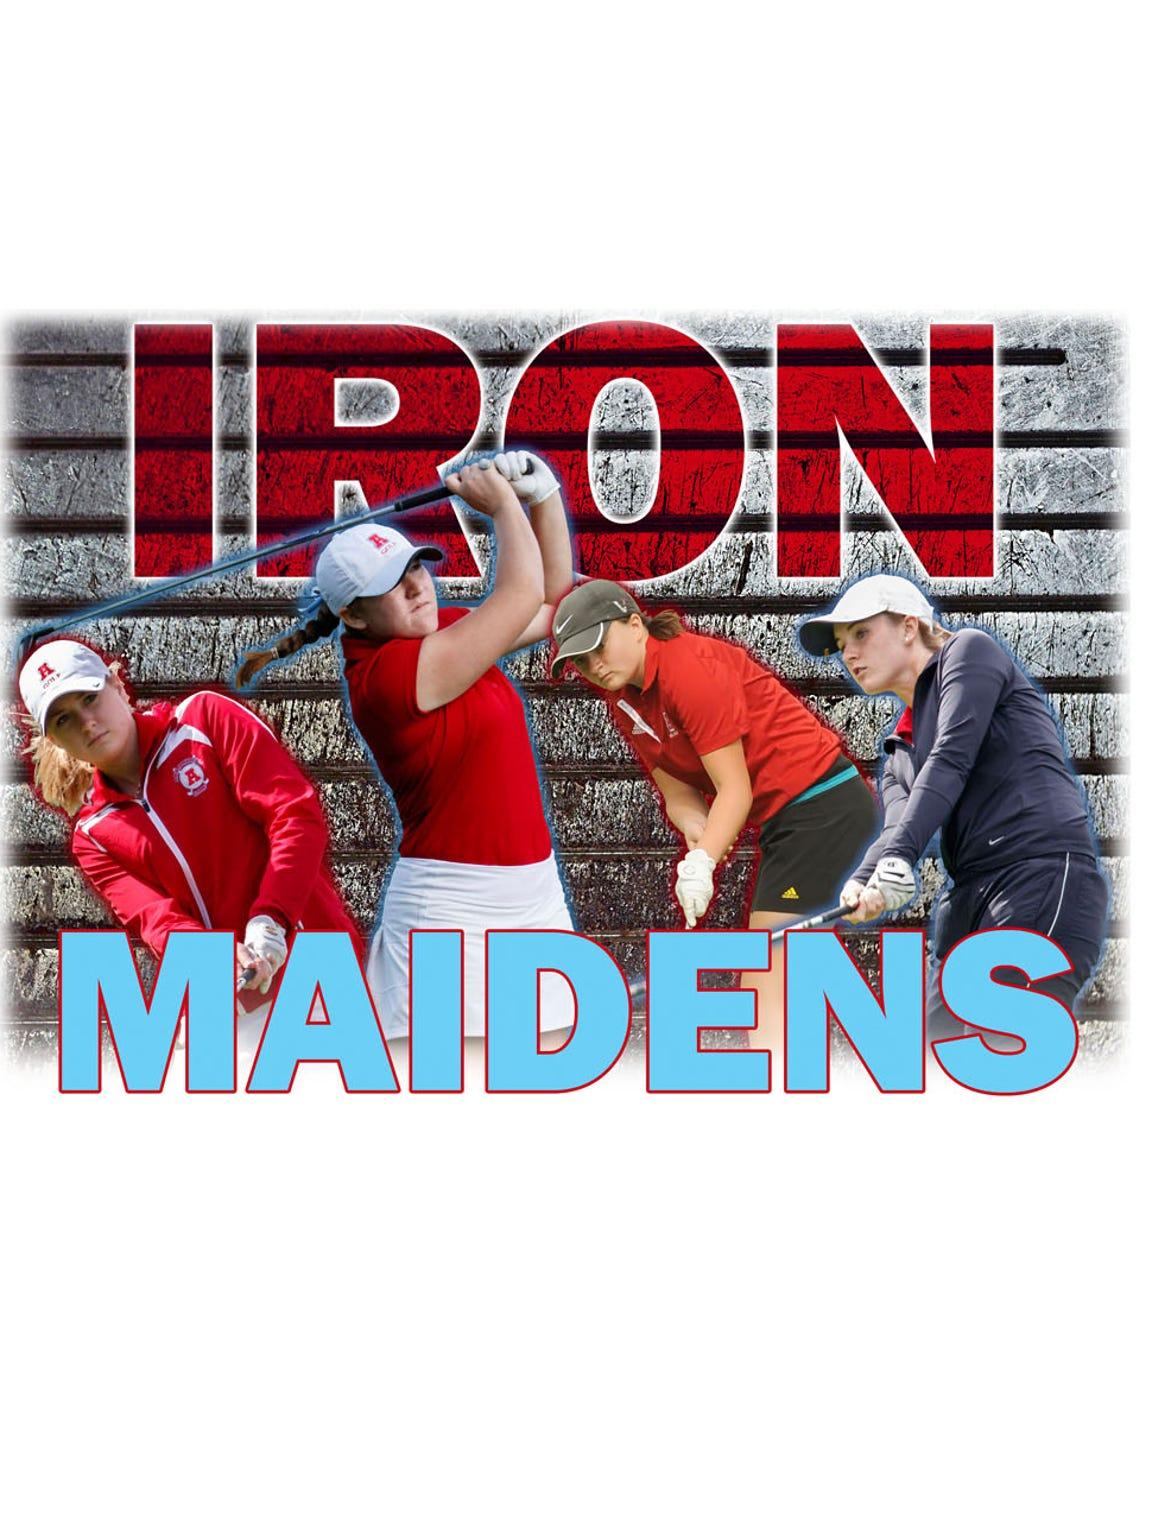 The Arrowhead girls golf team won the 2016 state championship